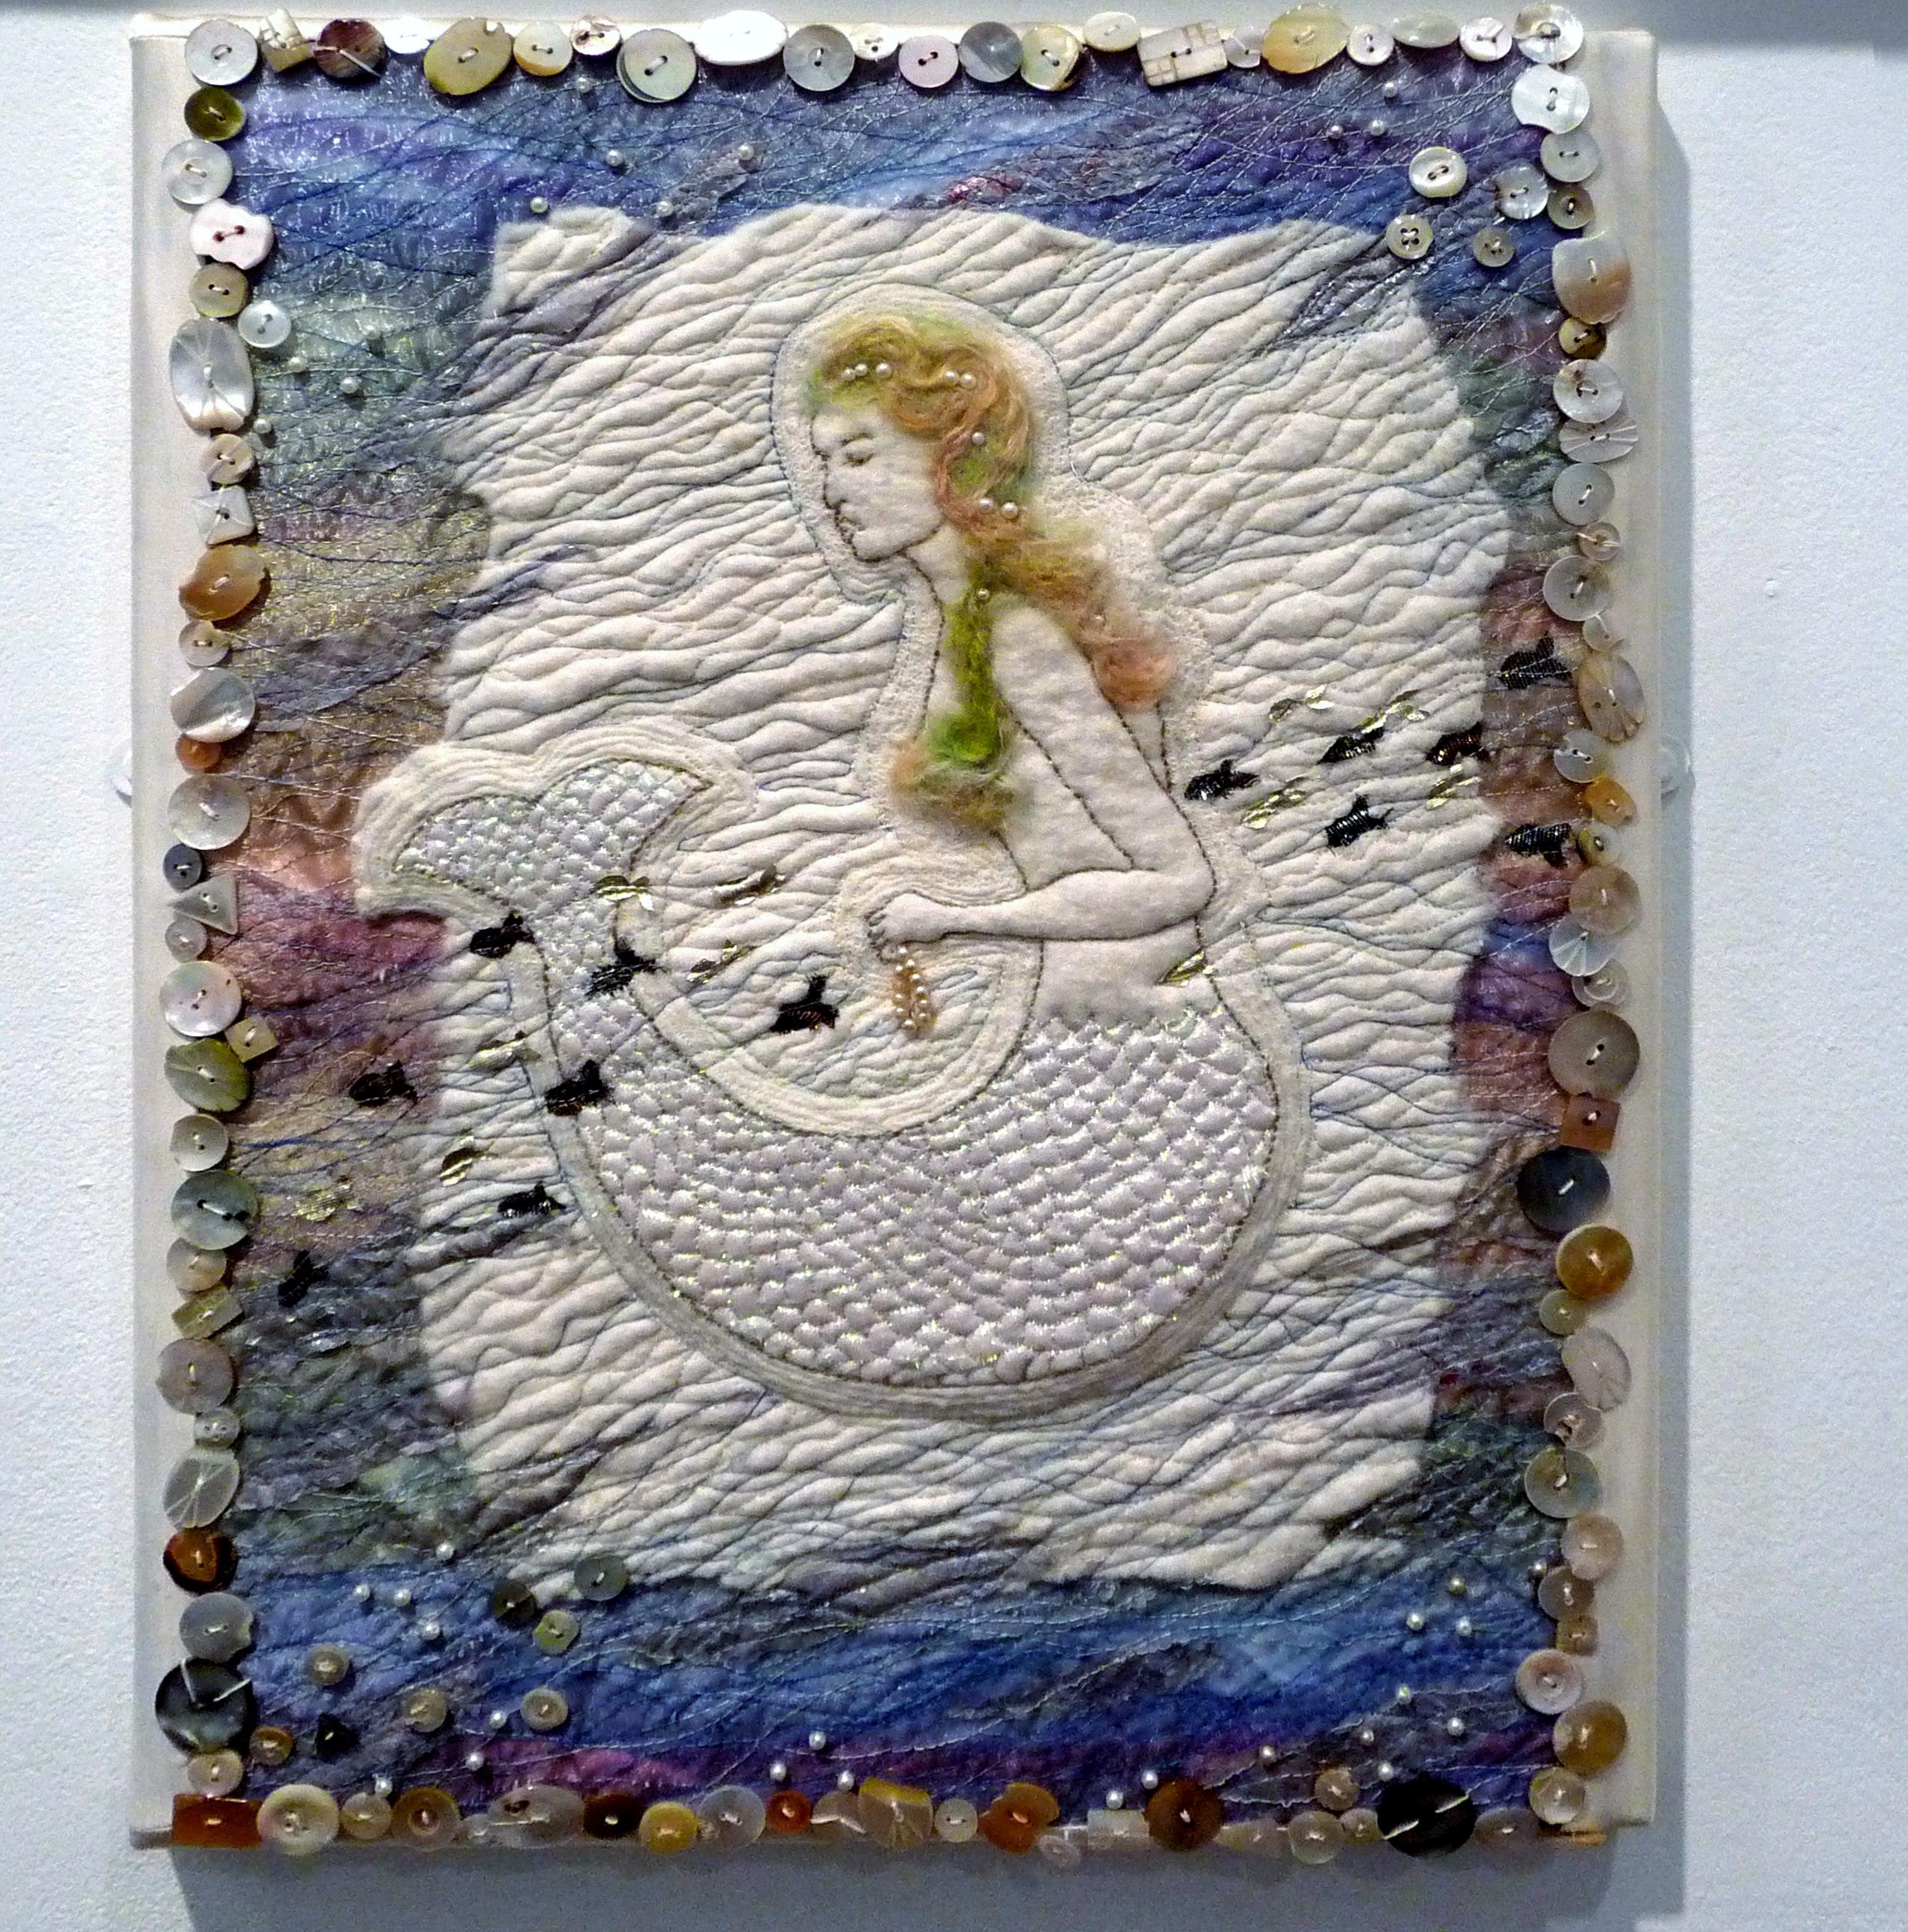 PEARL'S A MERMAID by Marilyn Fletcher, mixed media